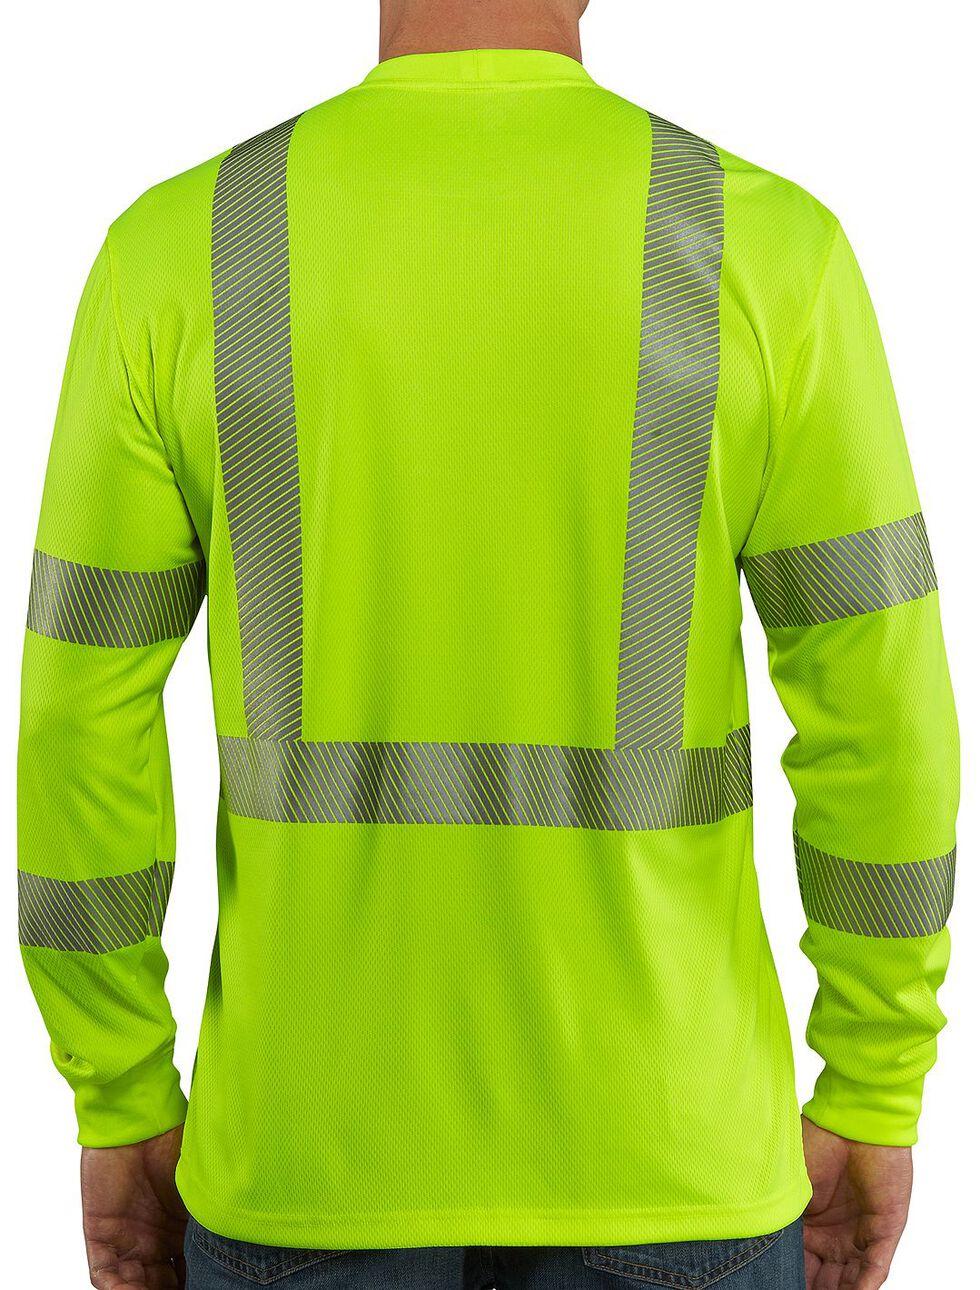 Carhartt Force High-Visibilty Class 3 Long Sleeve T-Shirt, Lime, hi-res